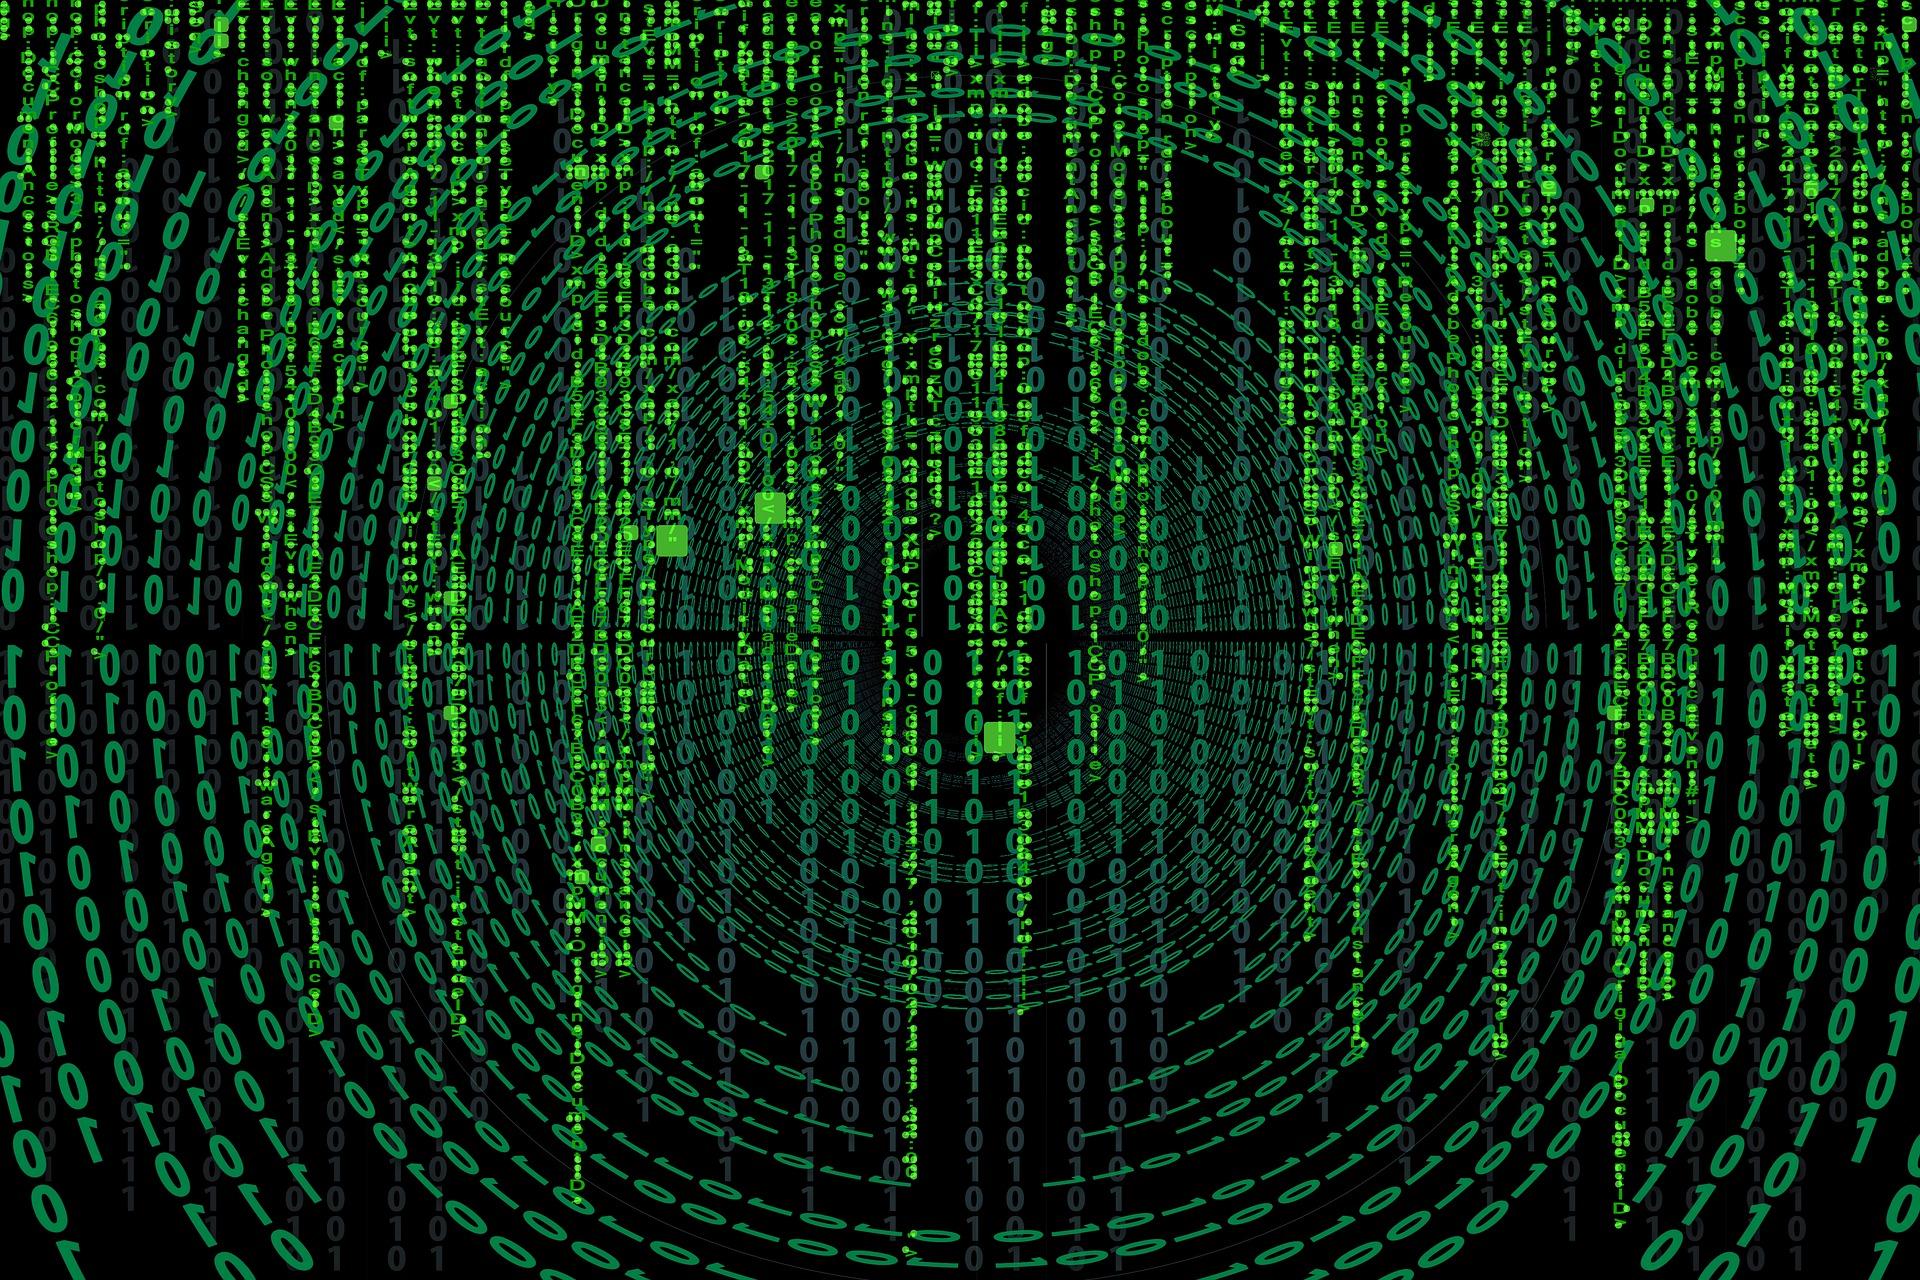 AI時代の到来で現実味を増す映画[Matrix]解析イベント!札幌開催決定☆